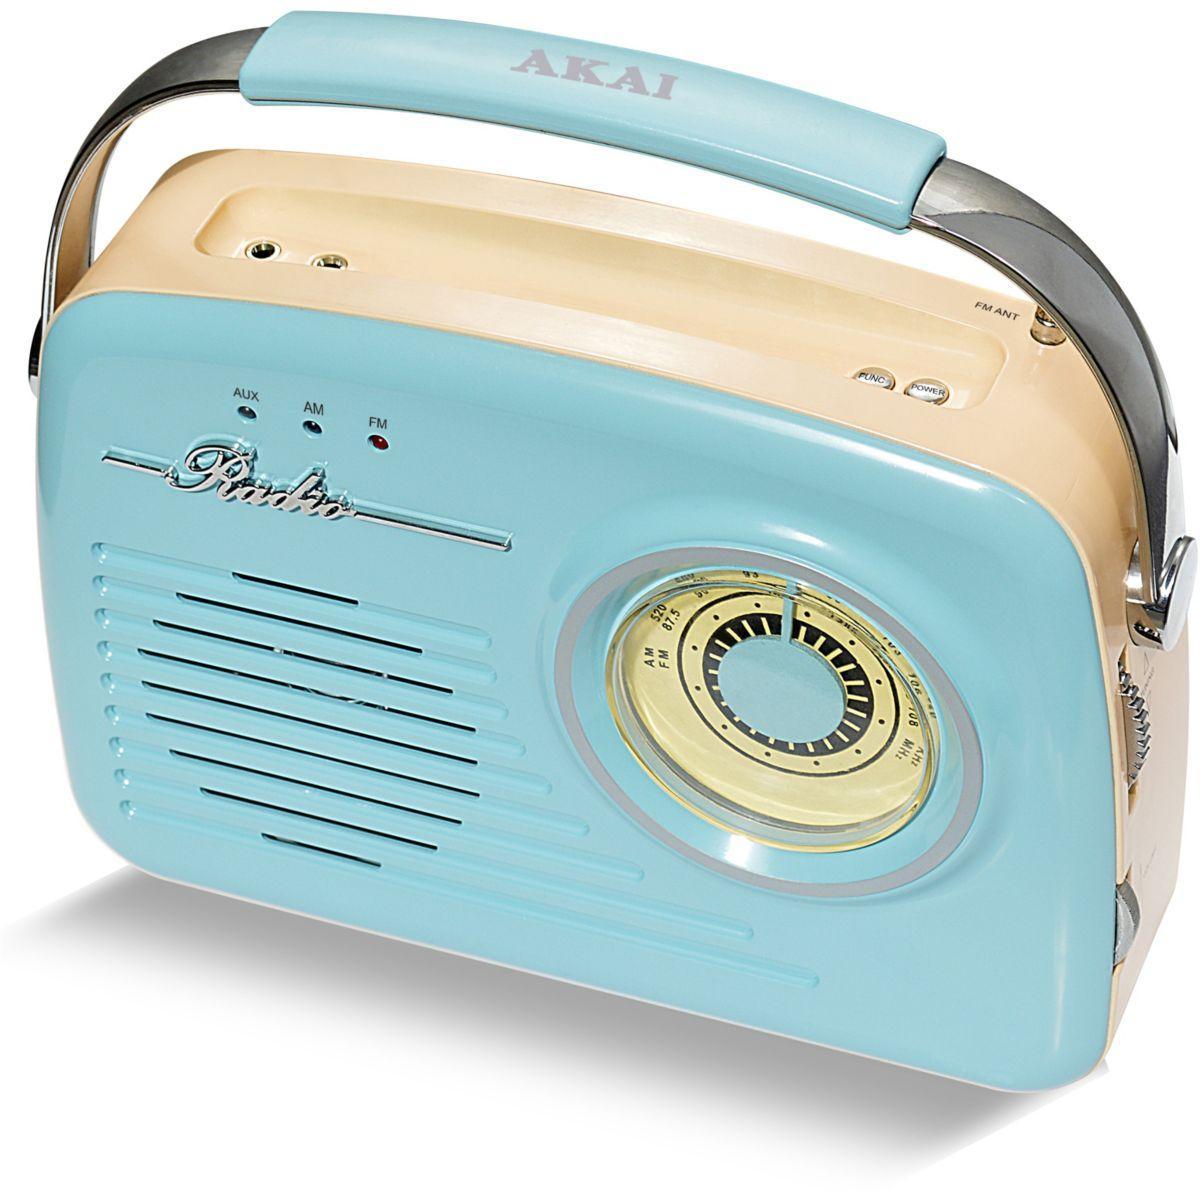 Radio akai ar-78 bleu - 20% de remise imm�diate avec le code : fete20 (photo)